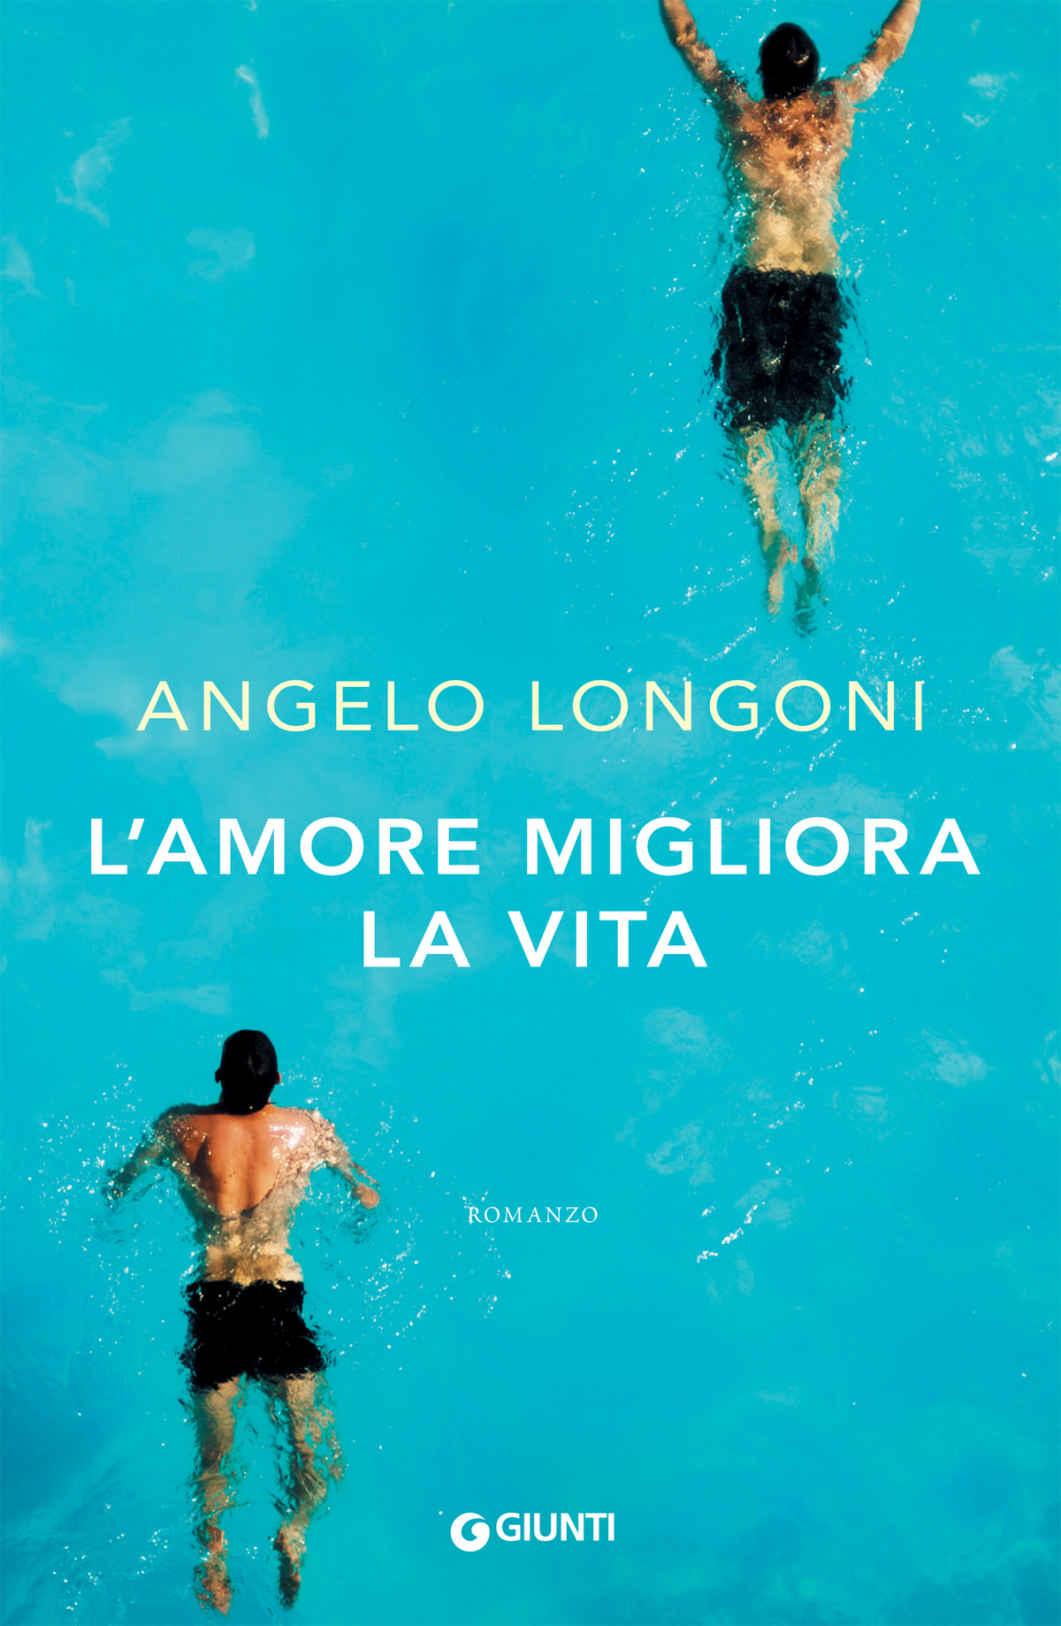 l amore migliora la vita - L'amore migliora la vita - Angelo Longoni: la recensione